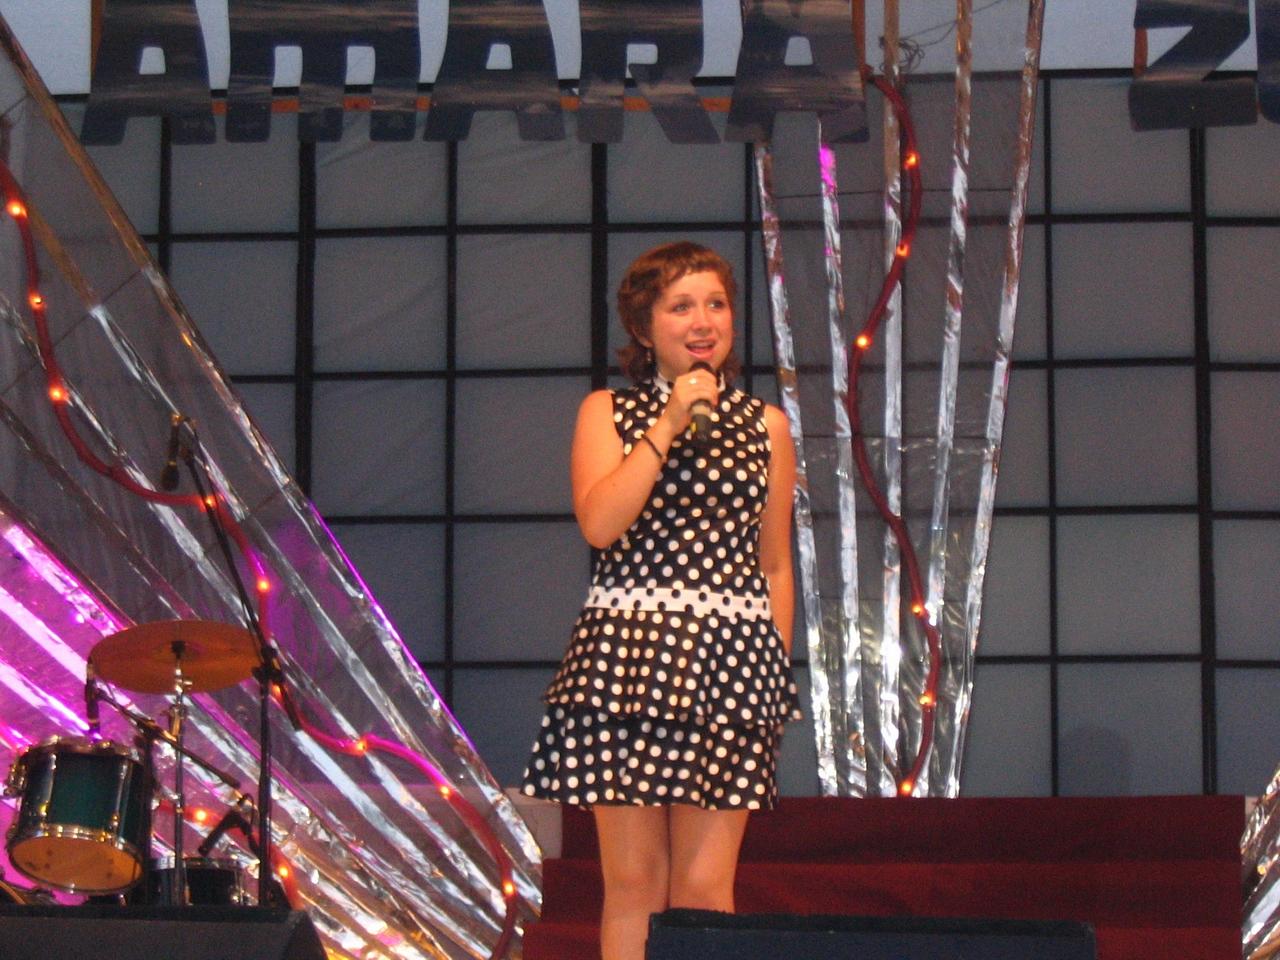 Amara 2006 - Premiul II - Loredana Cavasdan.jpg